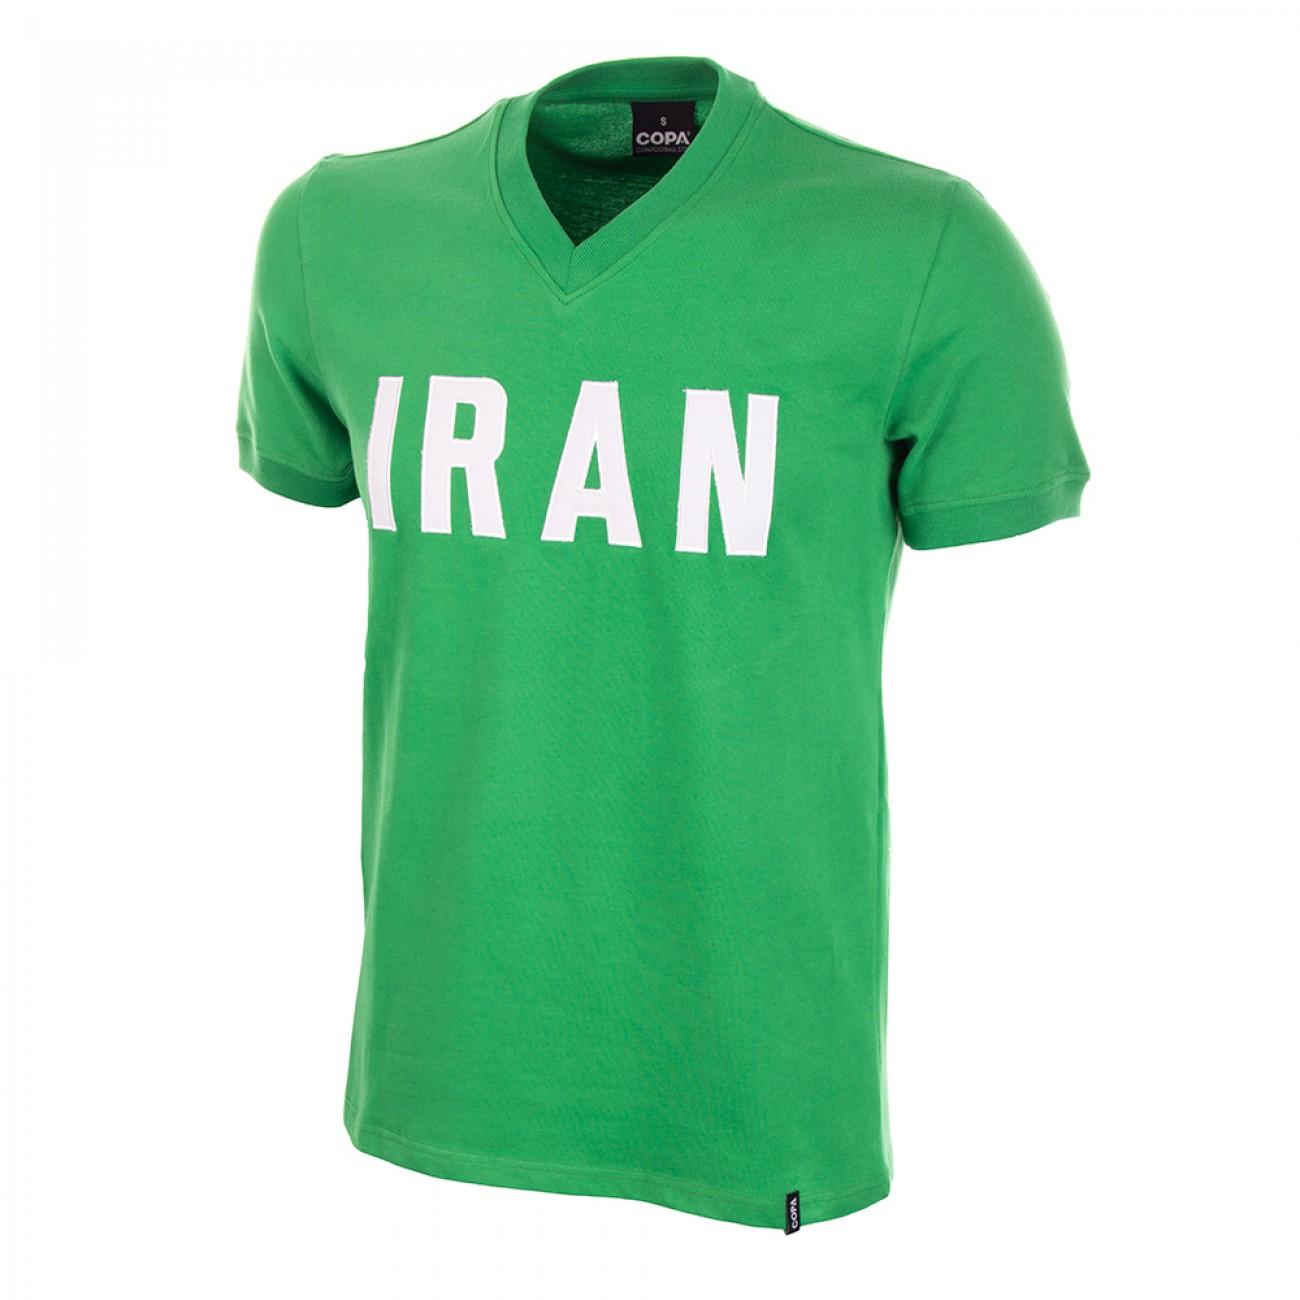 http://www.retrofootball.es/ropa-de-futbol/camiseta-iran-a-os-70.html